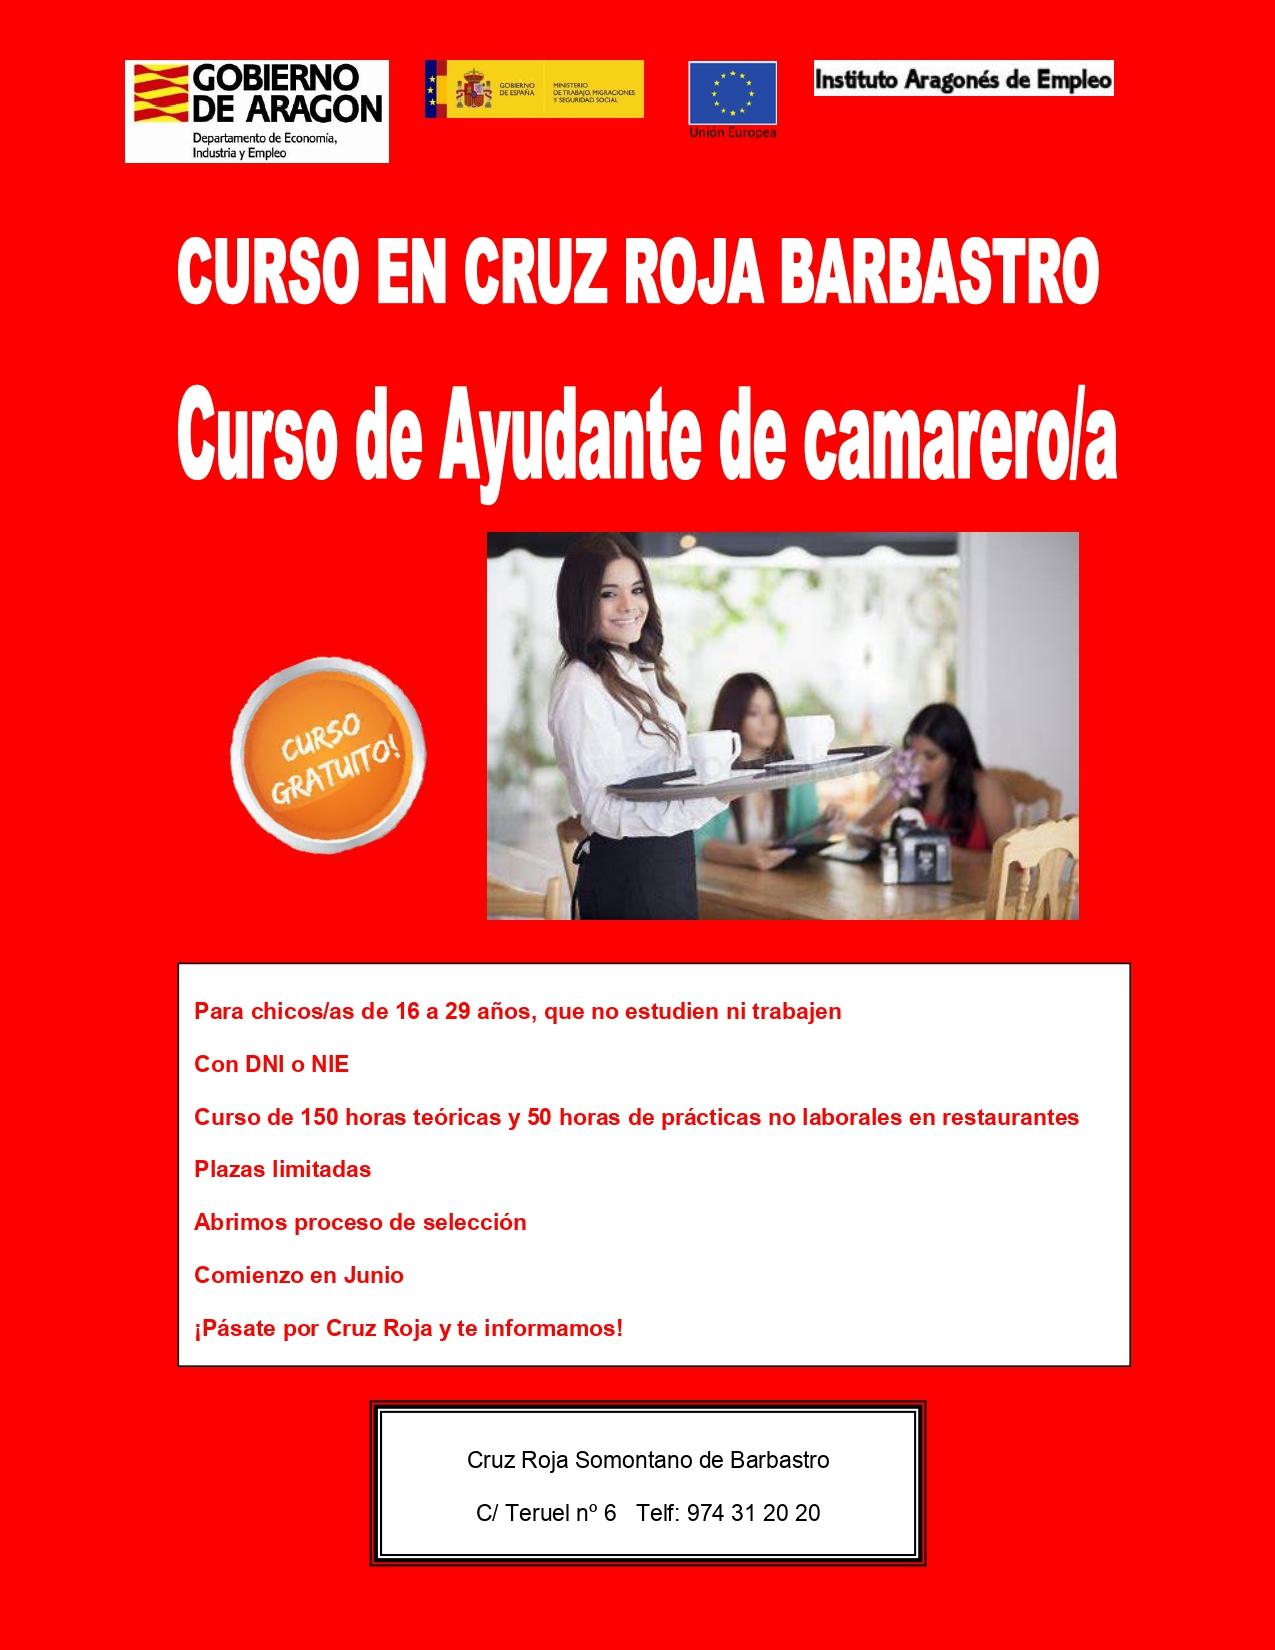 cartel cruz roja ayudante camarero_page-0001